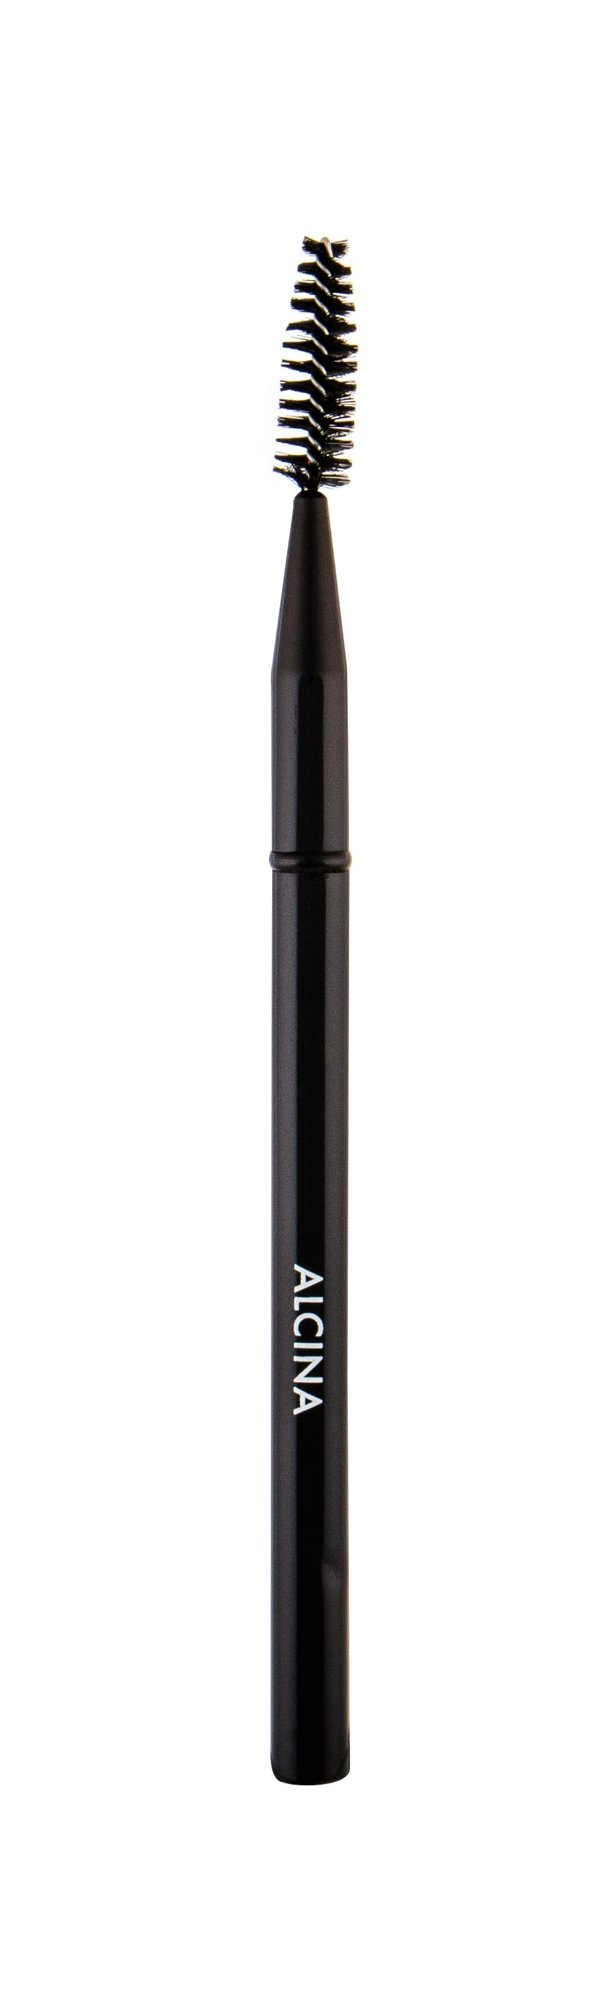 ALCINA Eyelash Brush Eyelashes Care 1ml